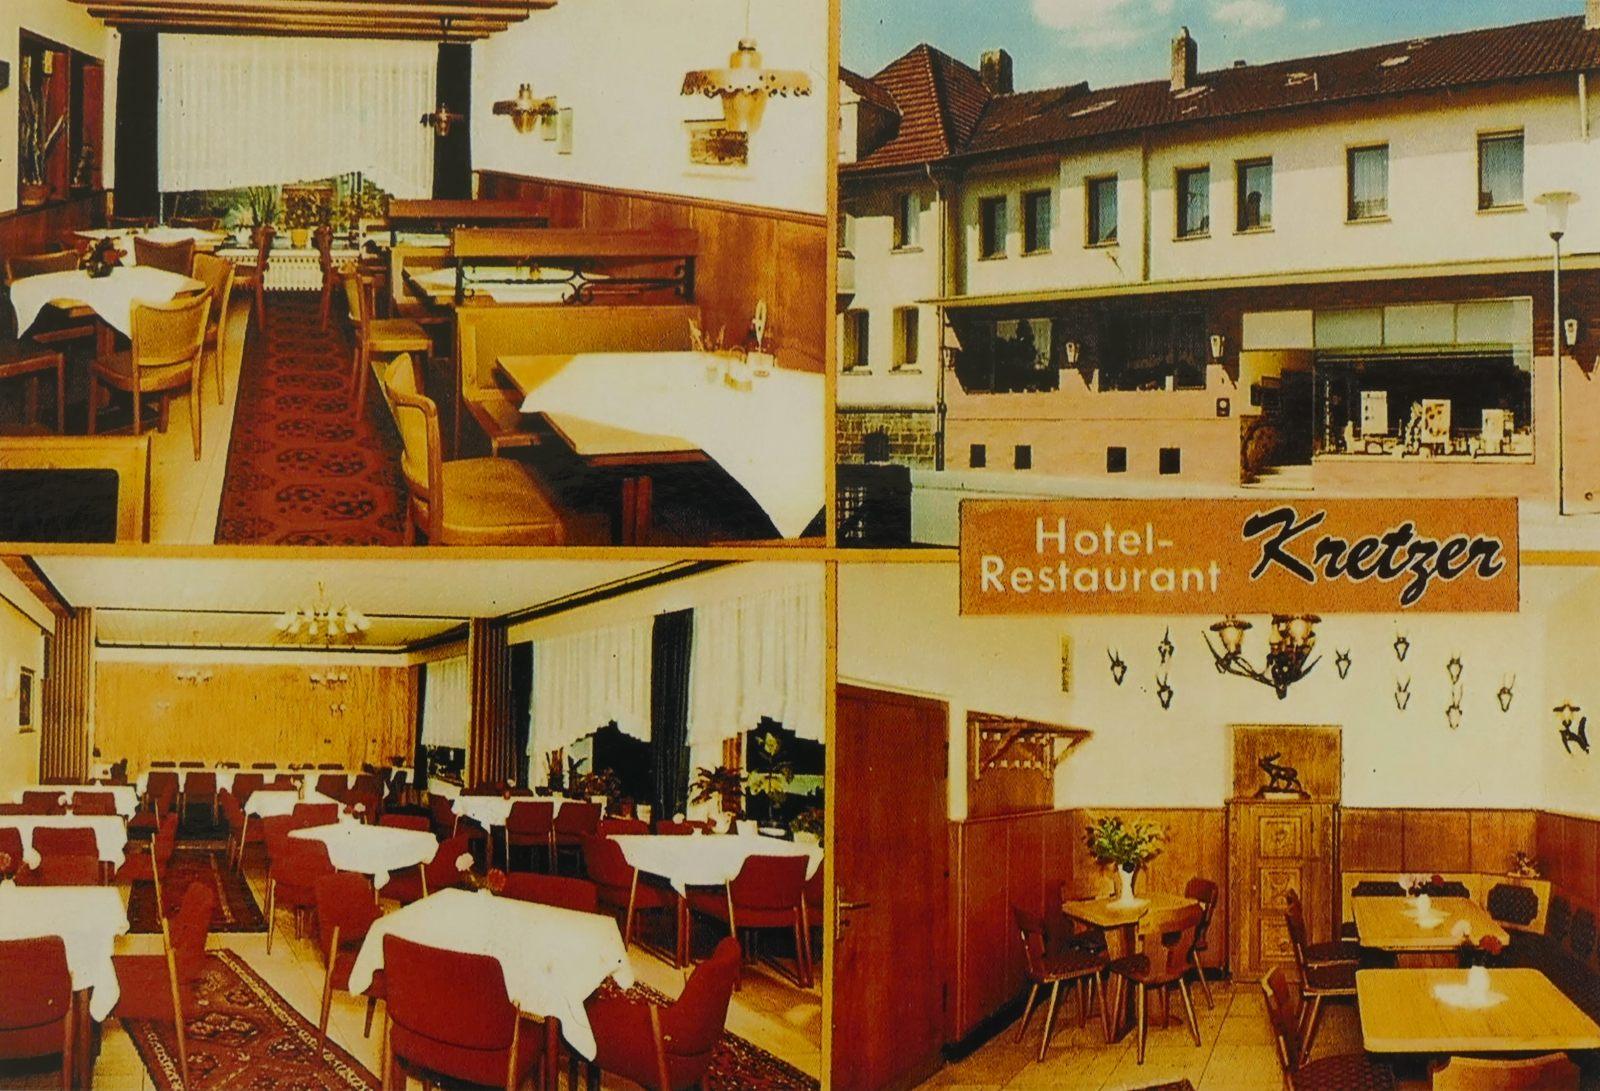 Café Restaurant Kretzer 1985